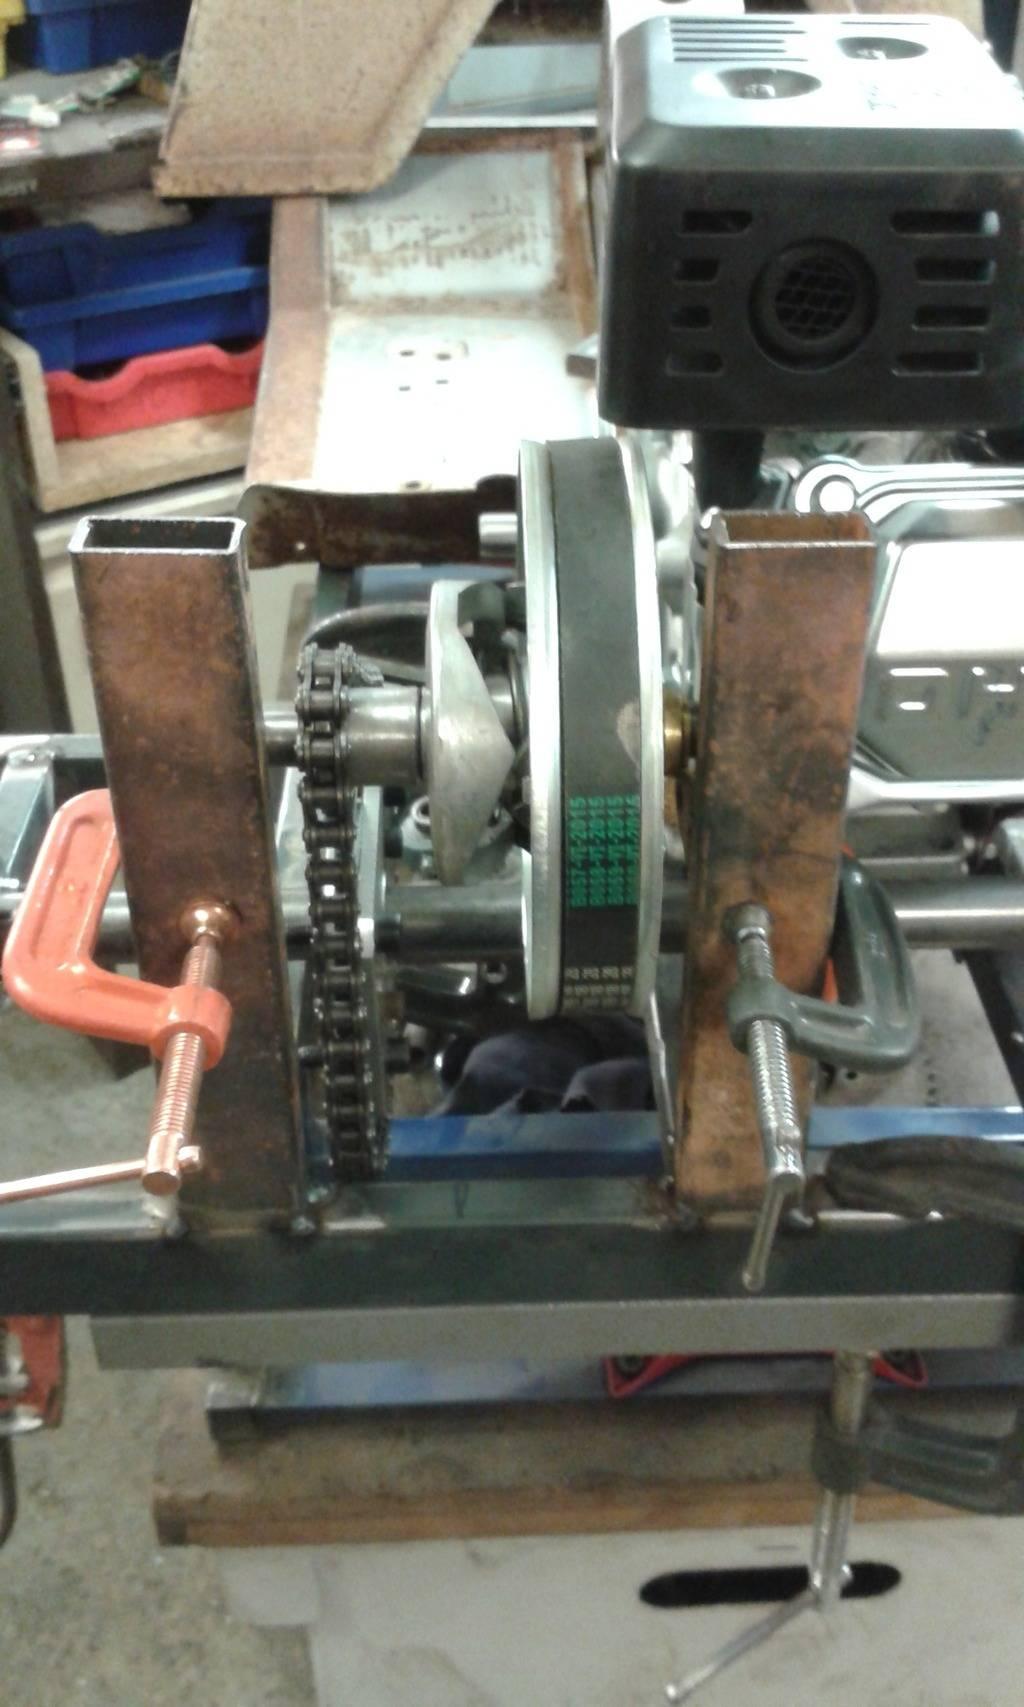 Mid-engined-rat-rod-racer MERRR! [2016 Build-Off Entry] 20160218_190048